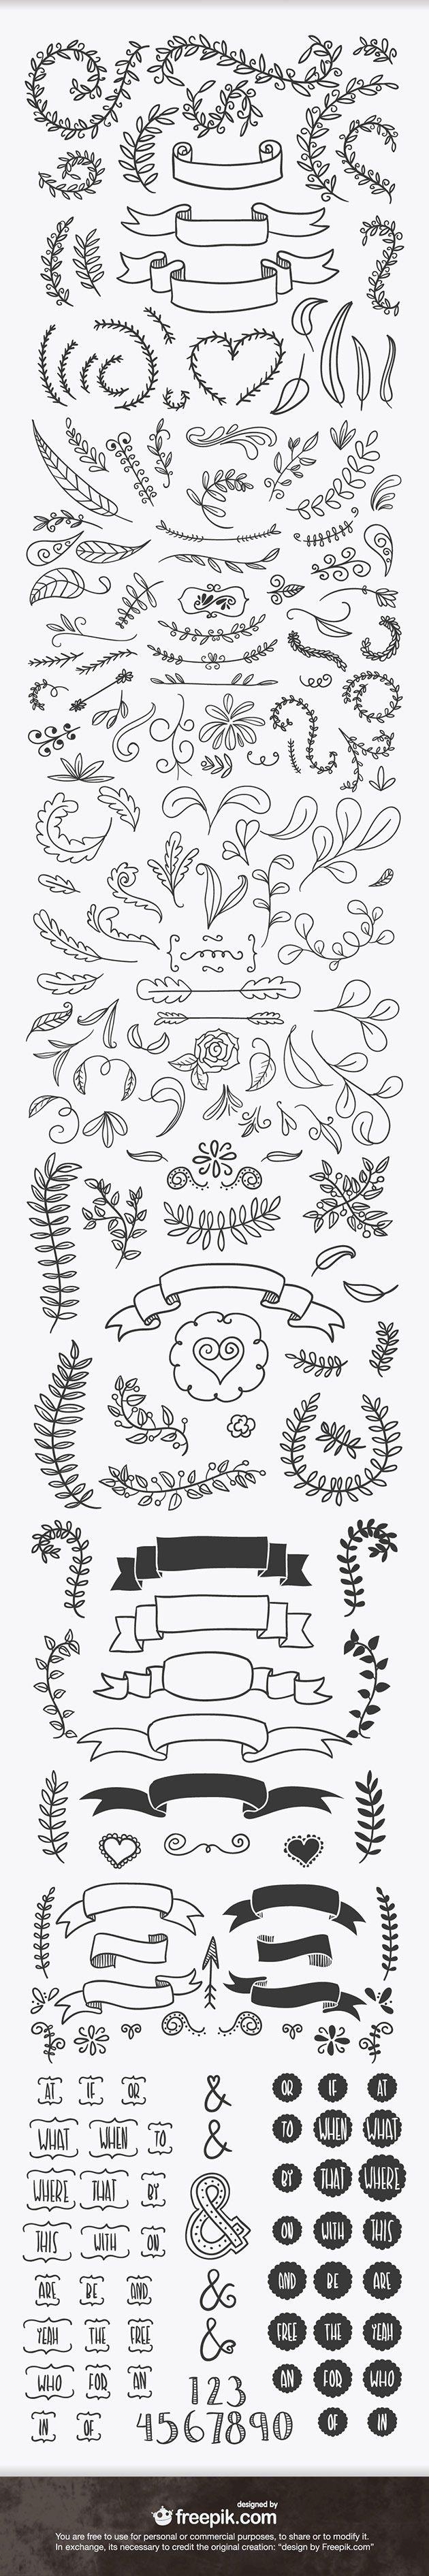 Hand sketched designs